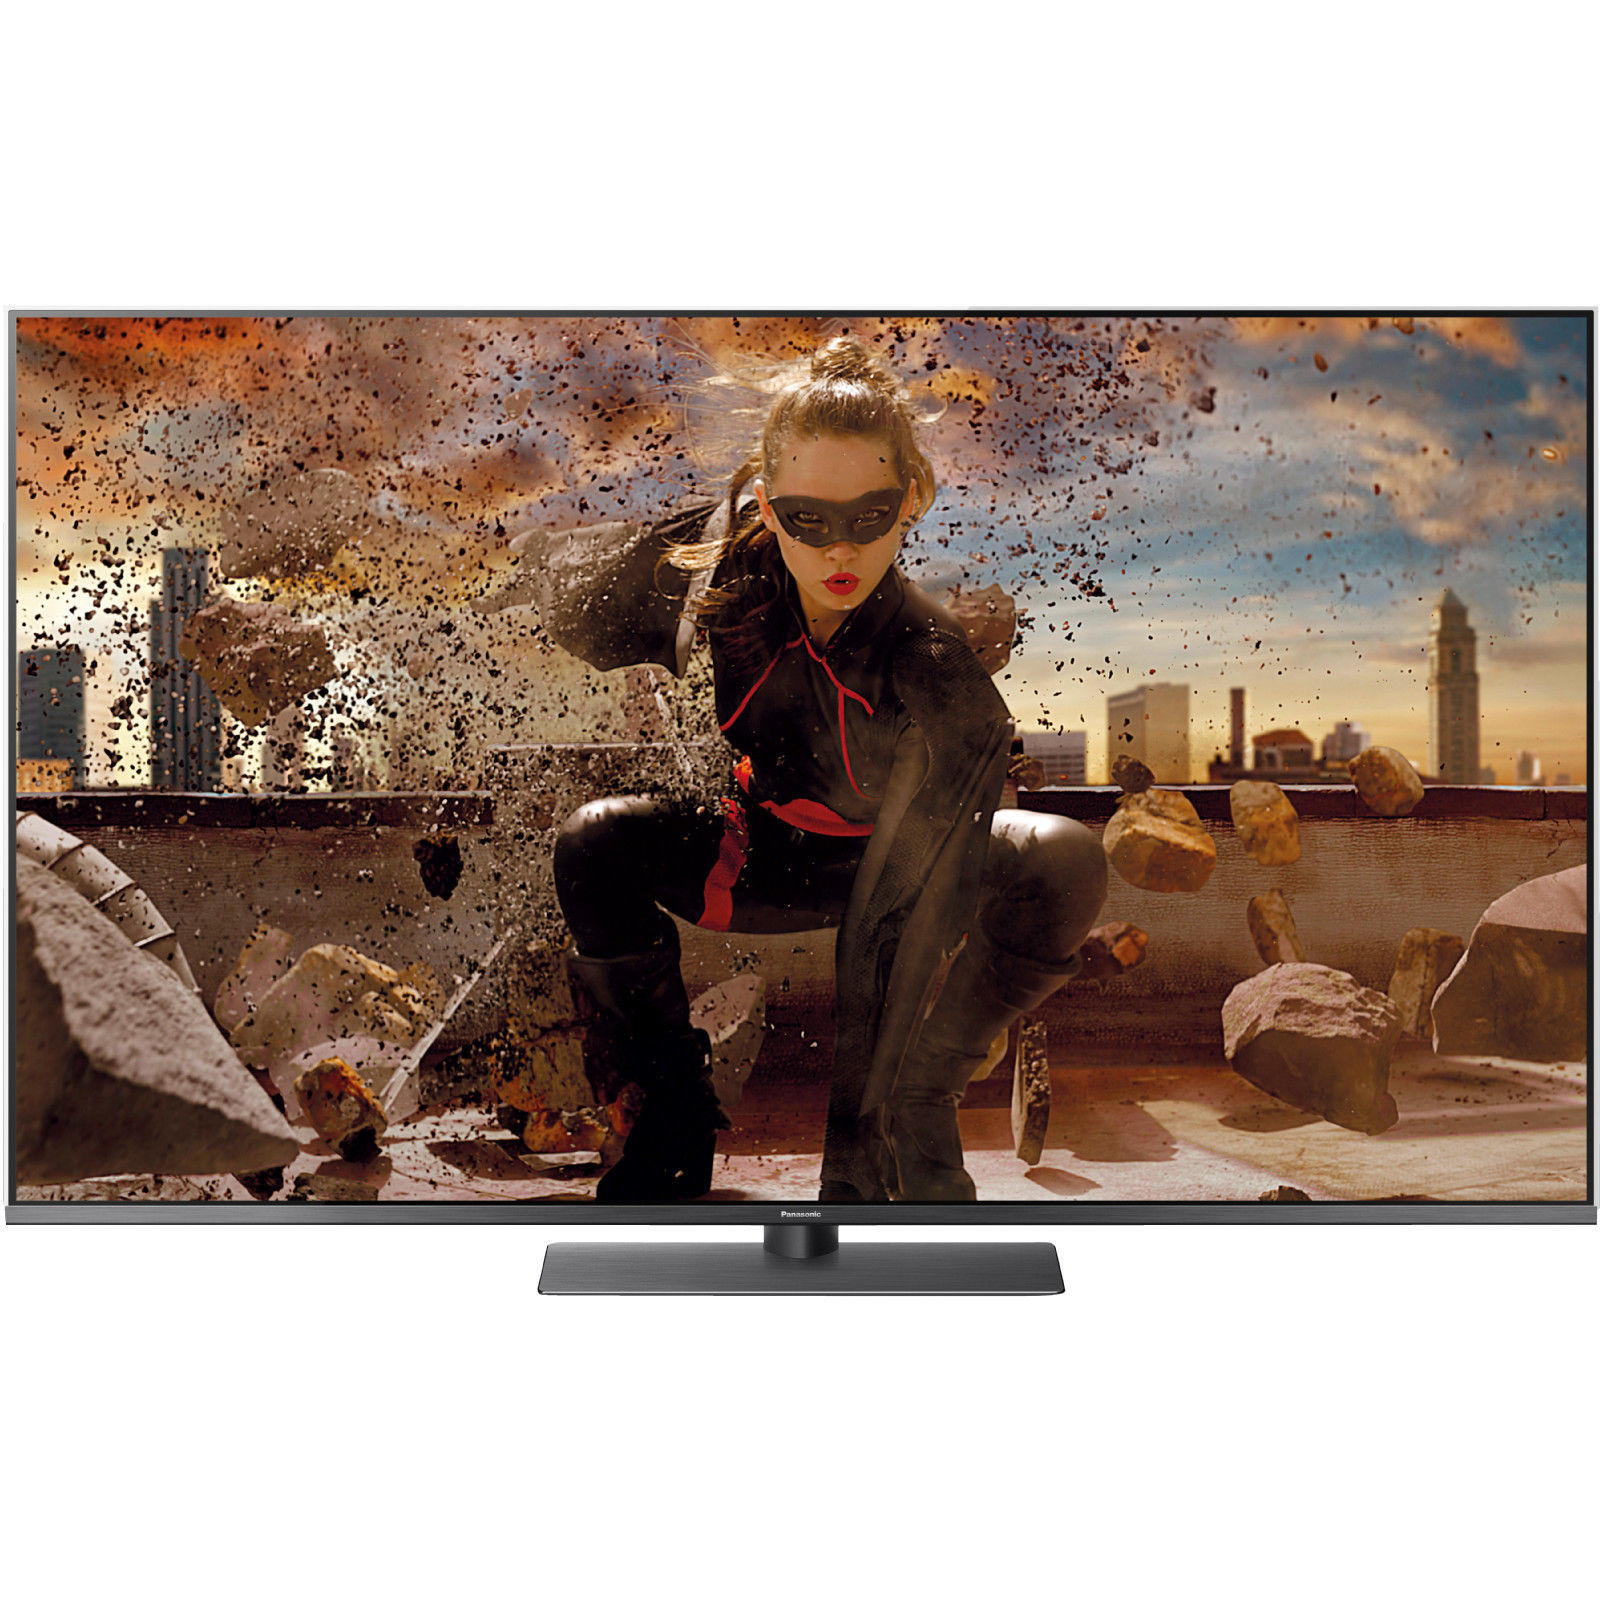 panasonic tx 65 fxw 784 led tv 65 zoll uhd 4k smart tv twin tuner wlan ebay. Black Bedroom Furniture Sets. Home Design Ideas